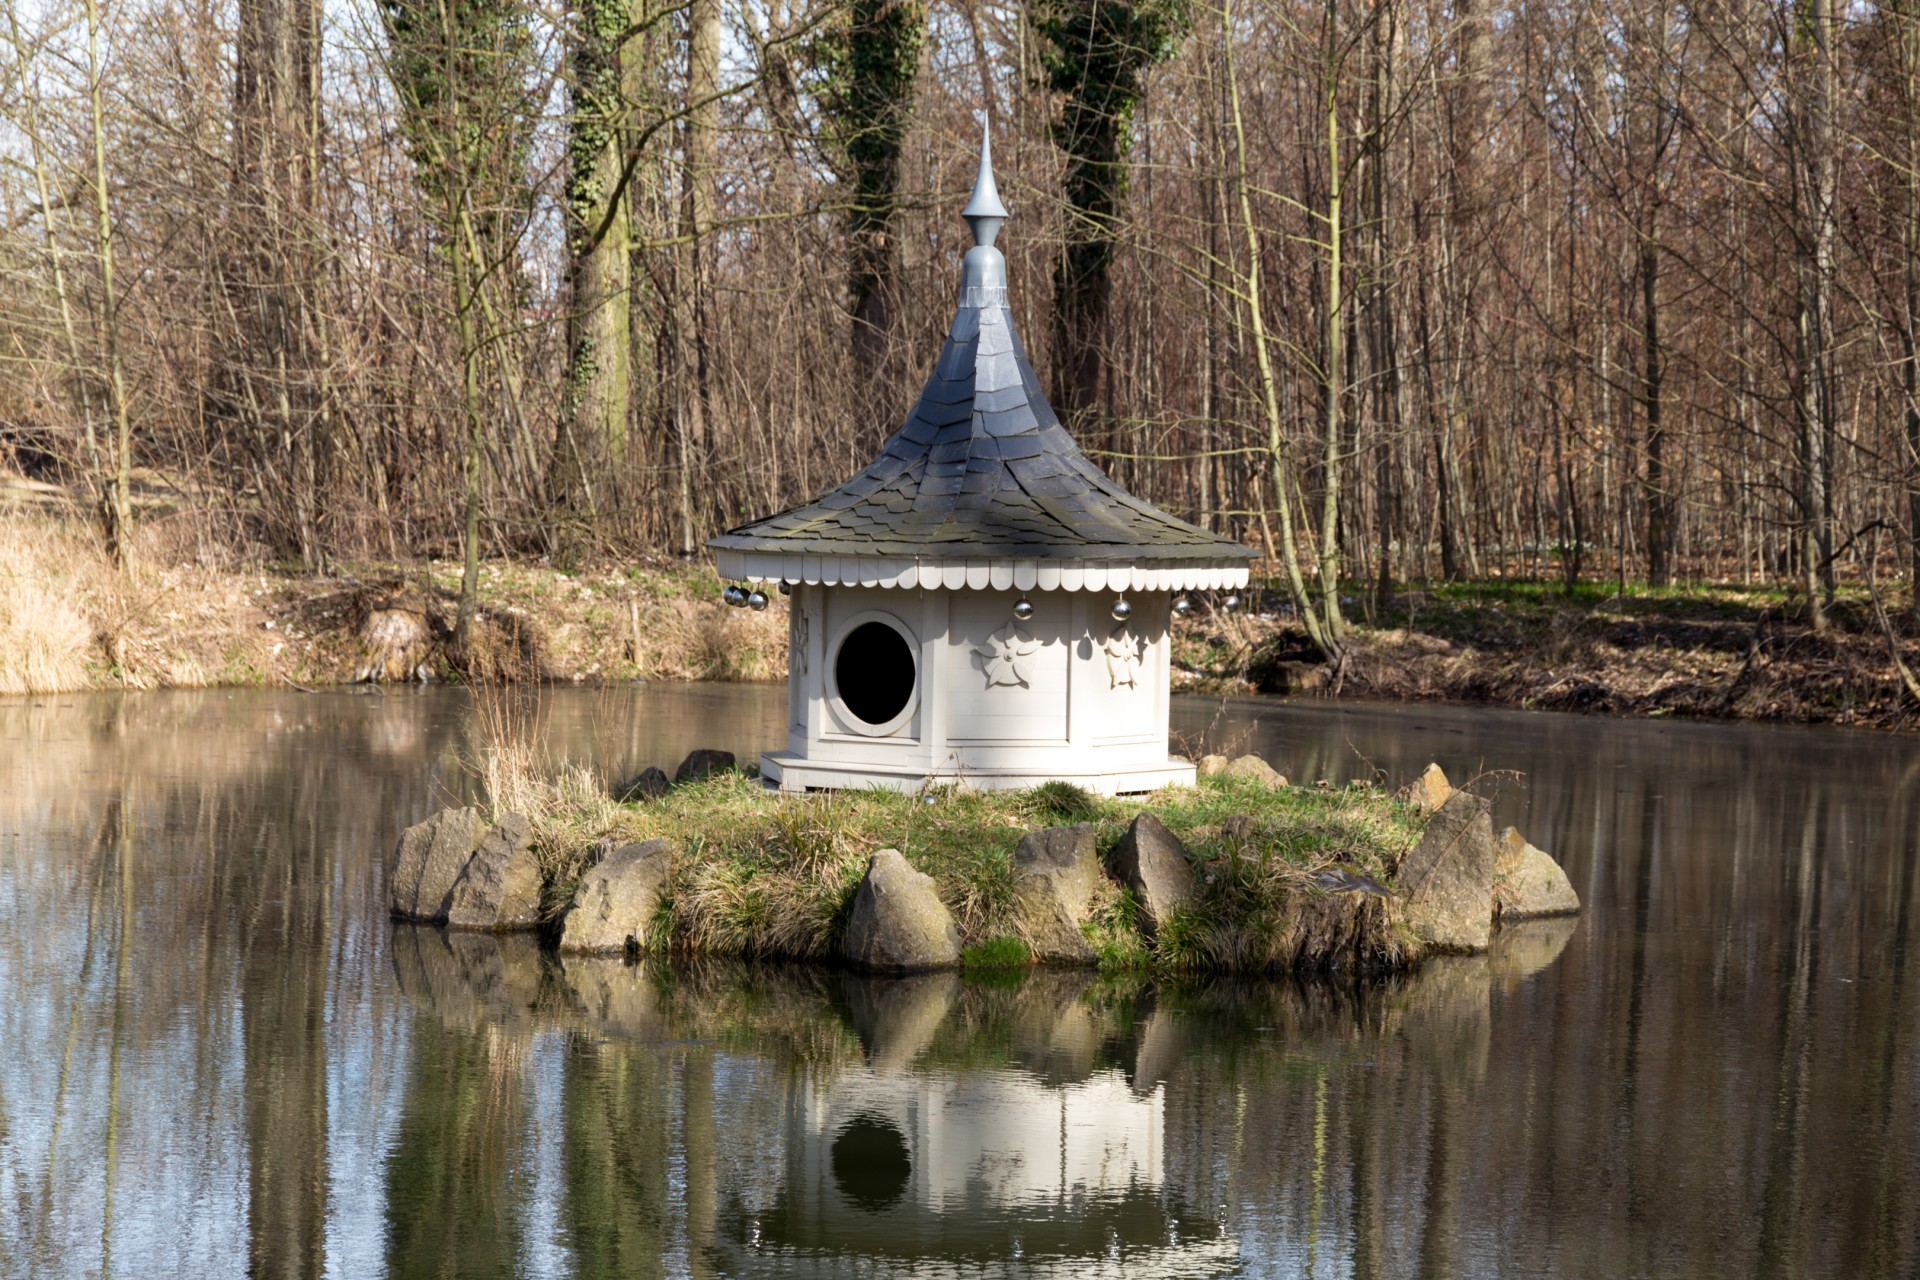 Ententeich im Schlosspark Lützschena